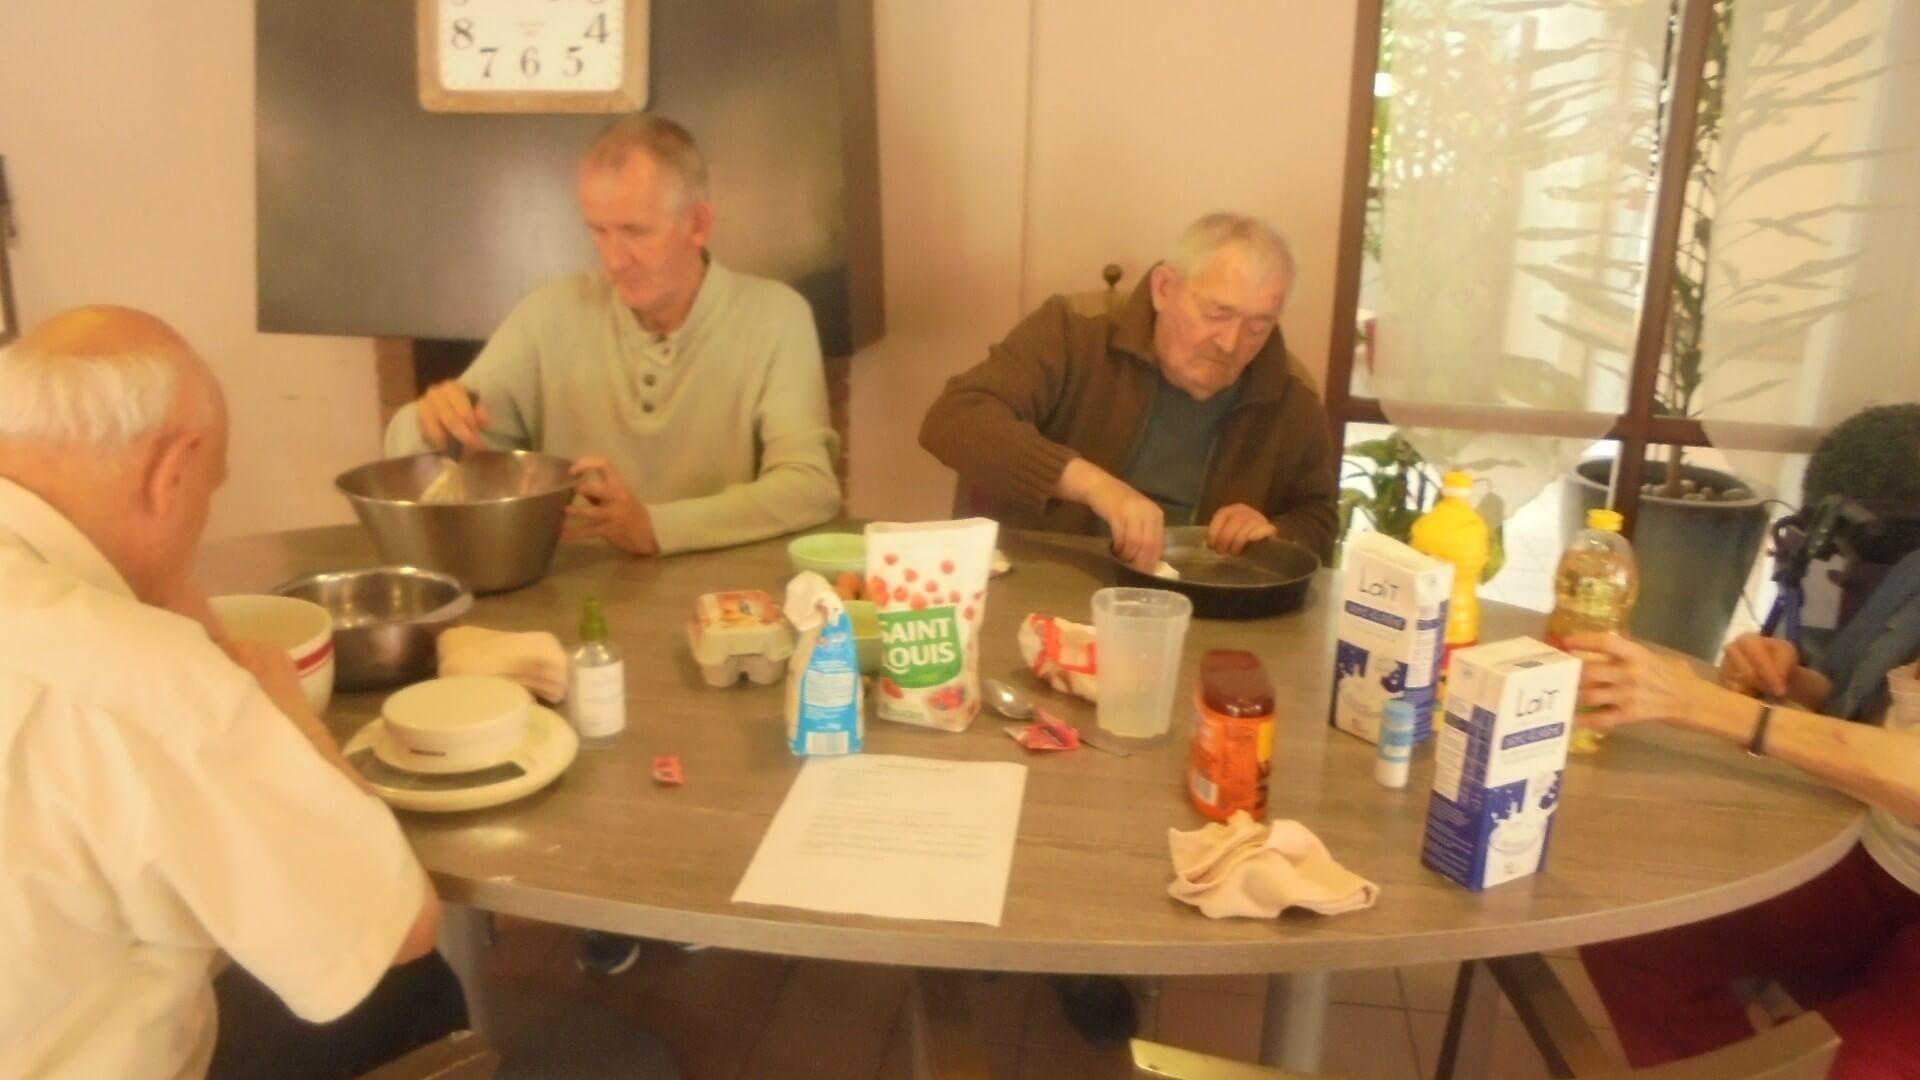 Atelier cuisine - le 02 Juin 2021